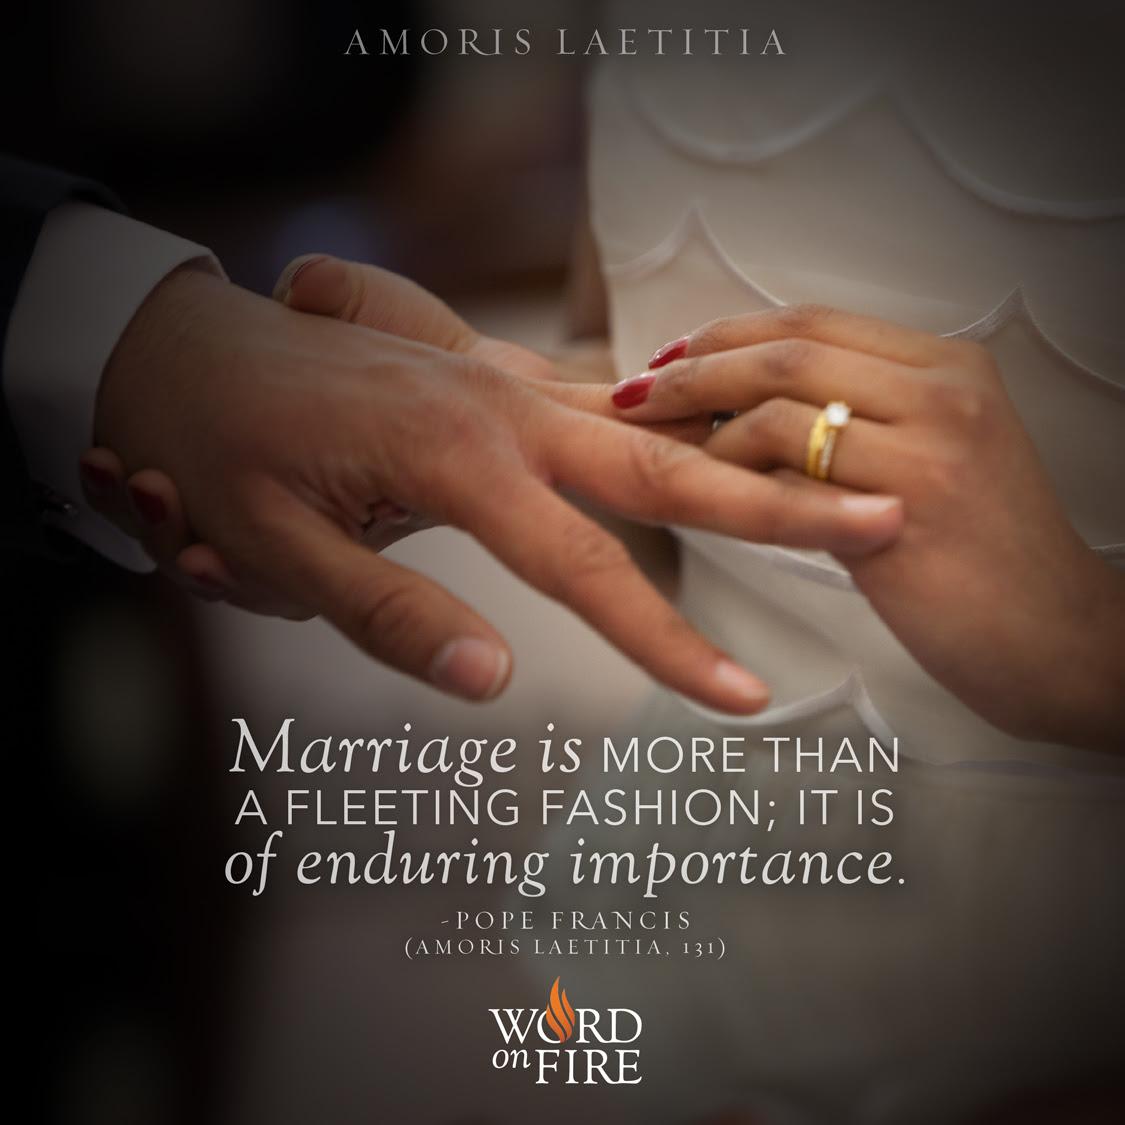 Prayergraphicscom Amoris Laetitia Marriage Is More Than A